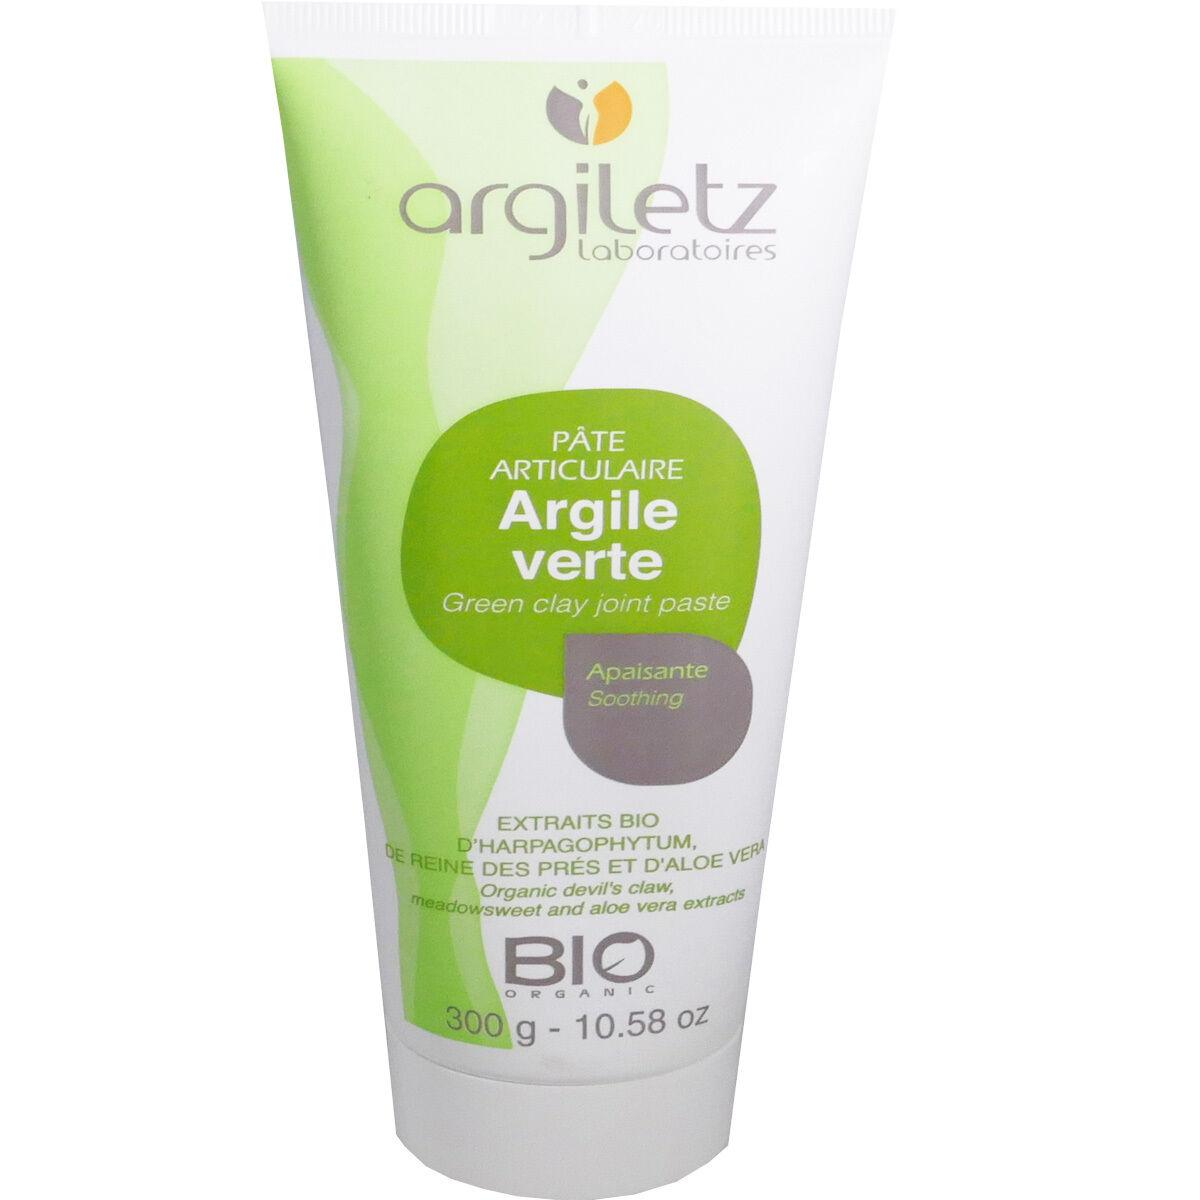 Argiletz argile verte apaisant 300 g bio